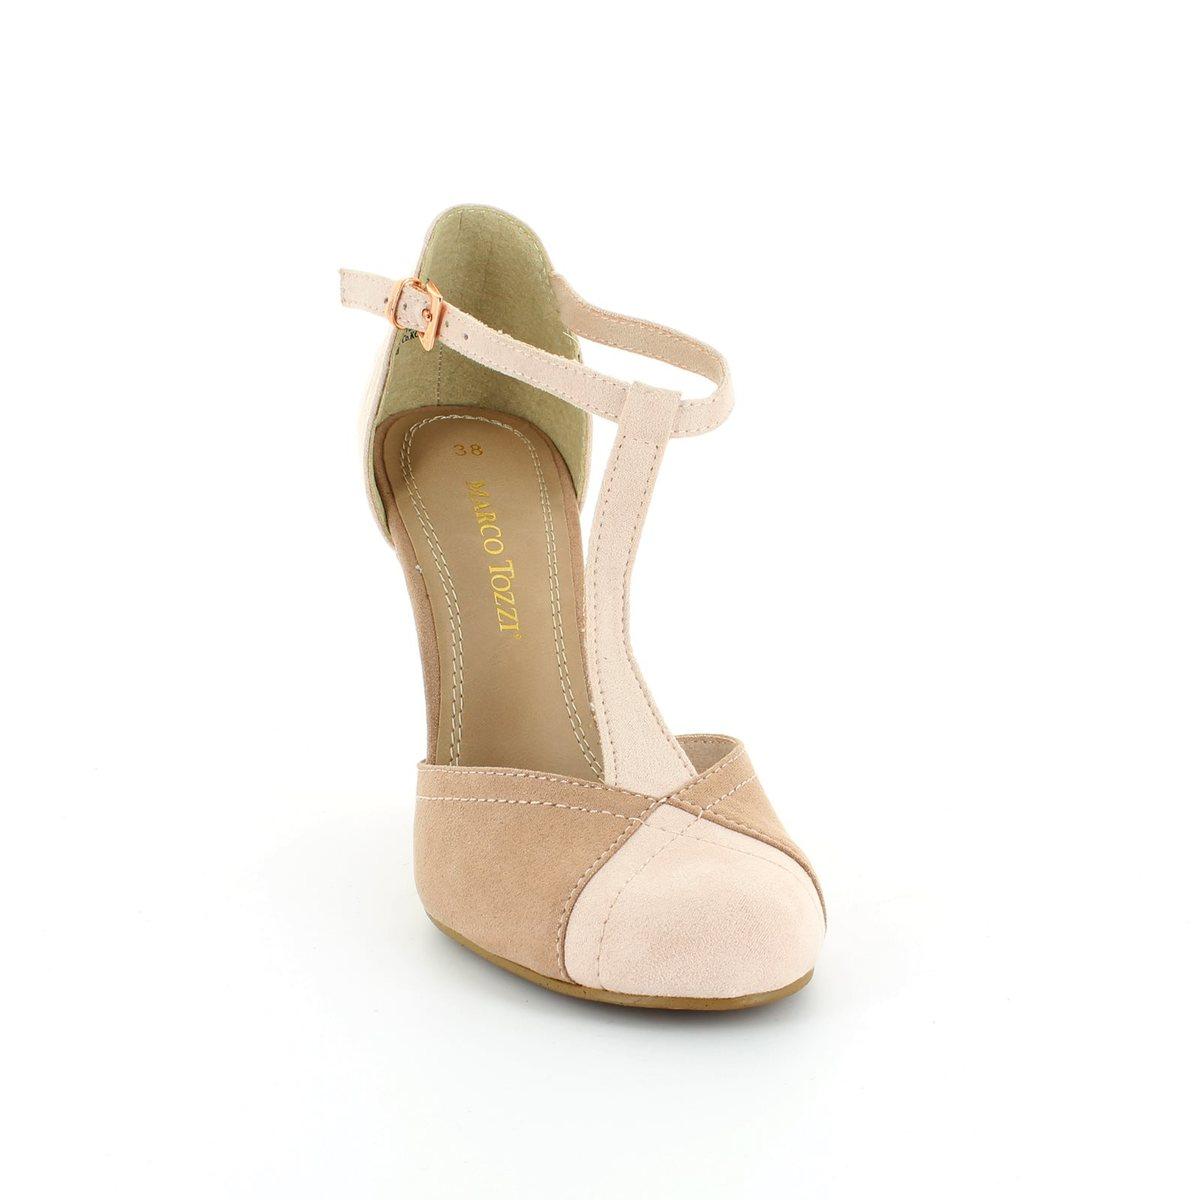 marco tozzi empolit 24405 596 pink high heeled shoes. Black Bedroom Furniture Sets. Home Design Ideas